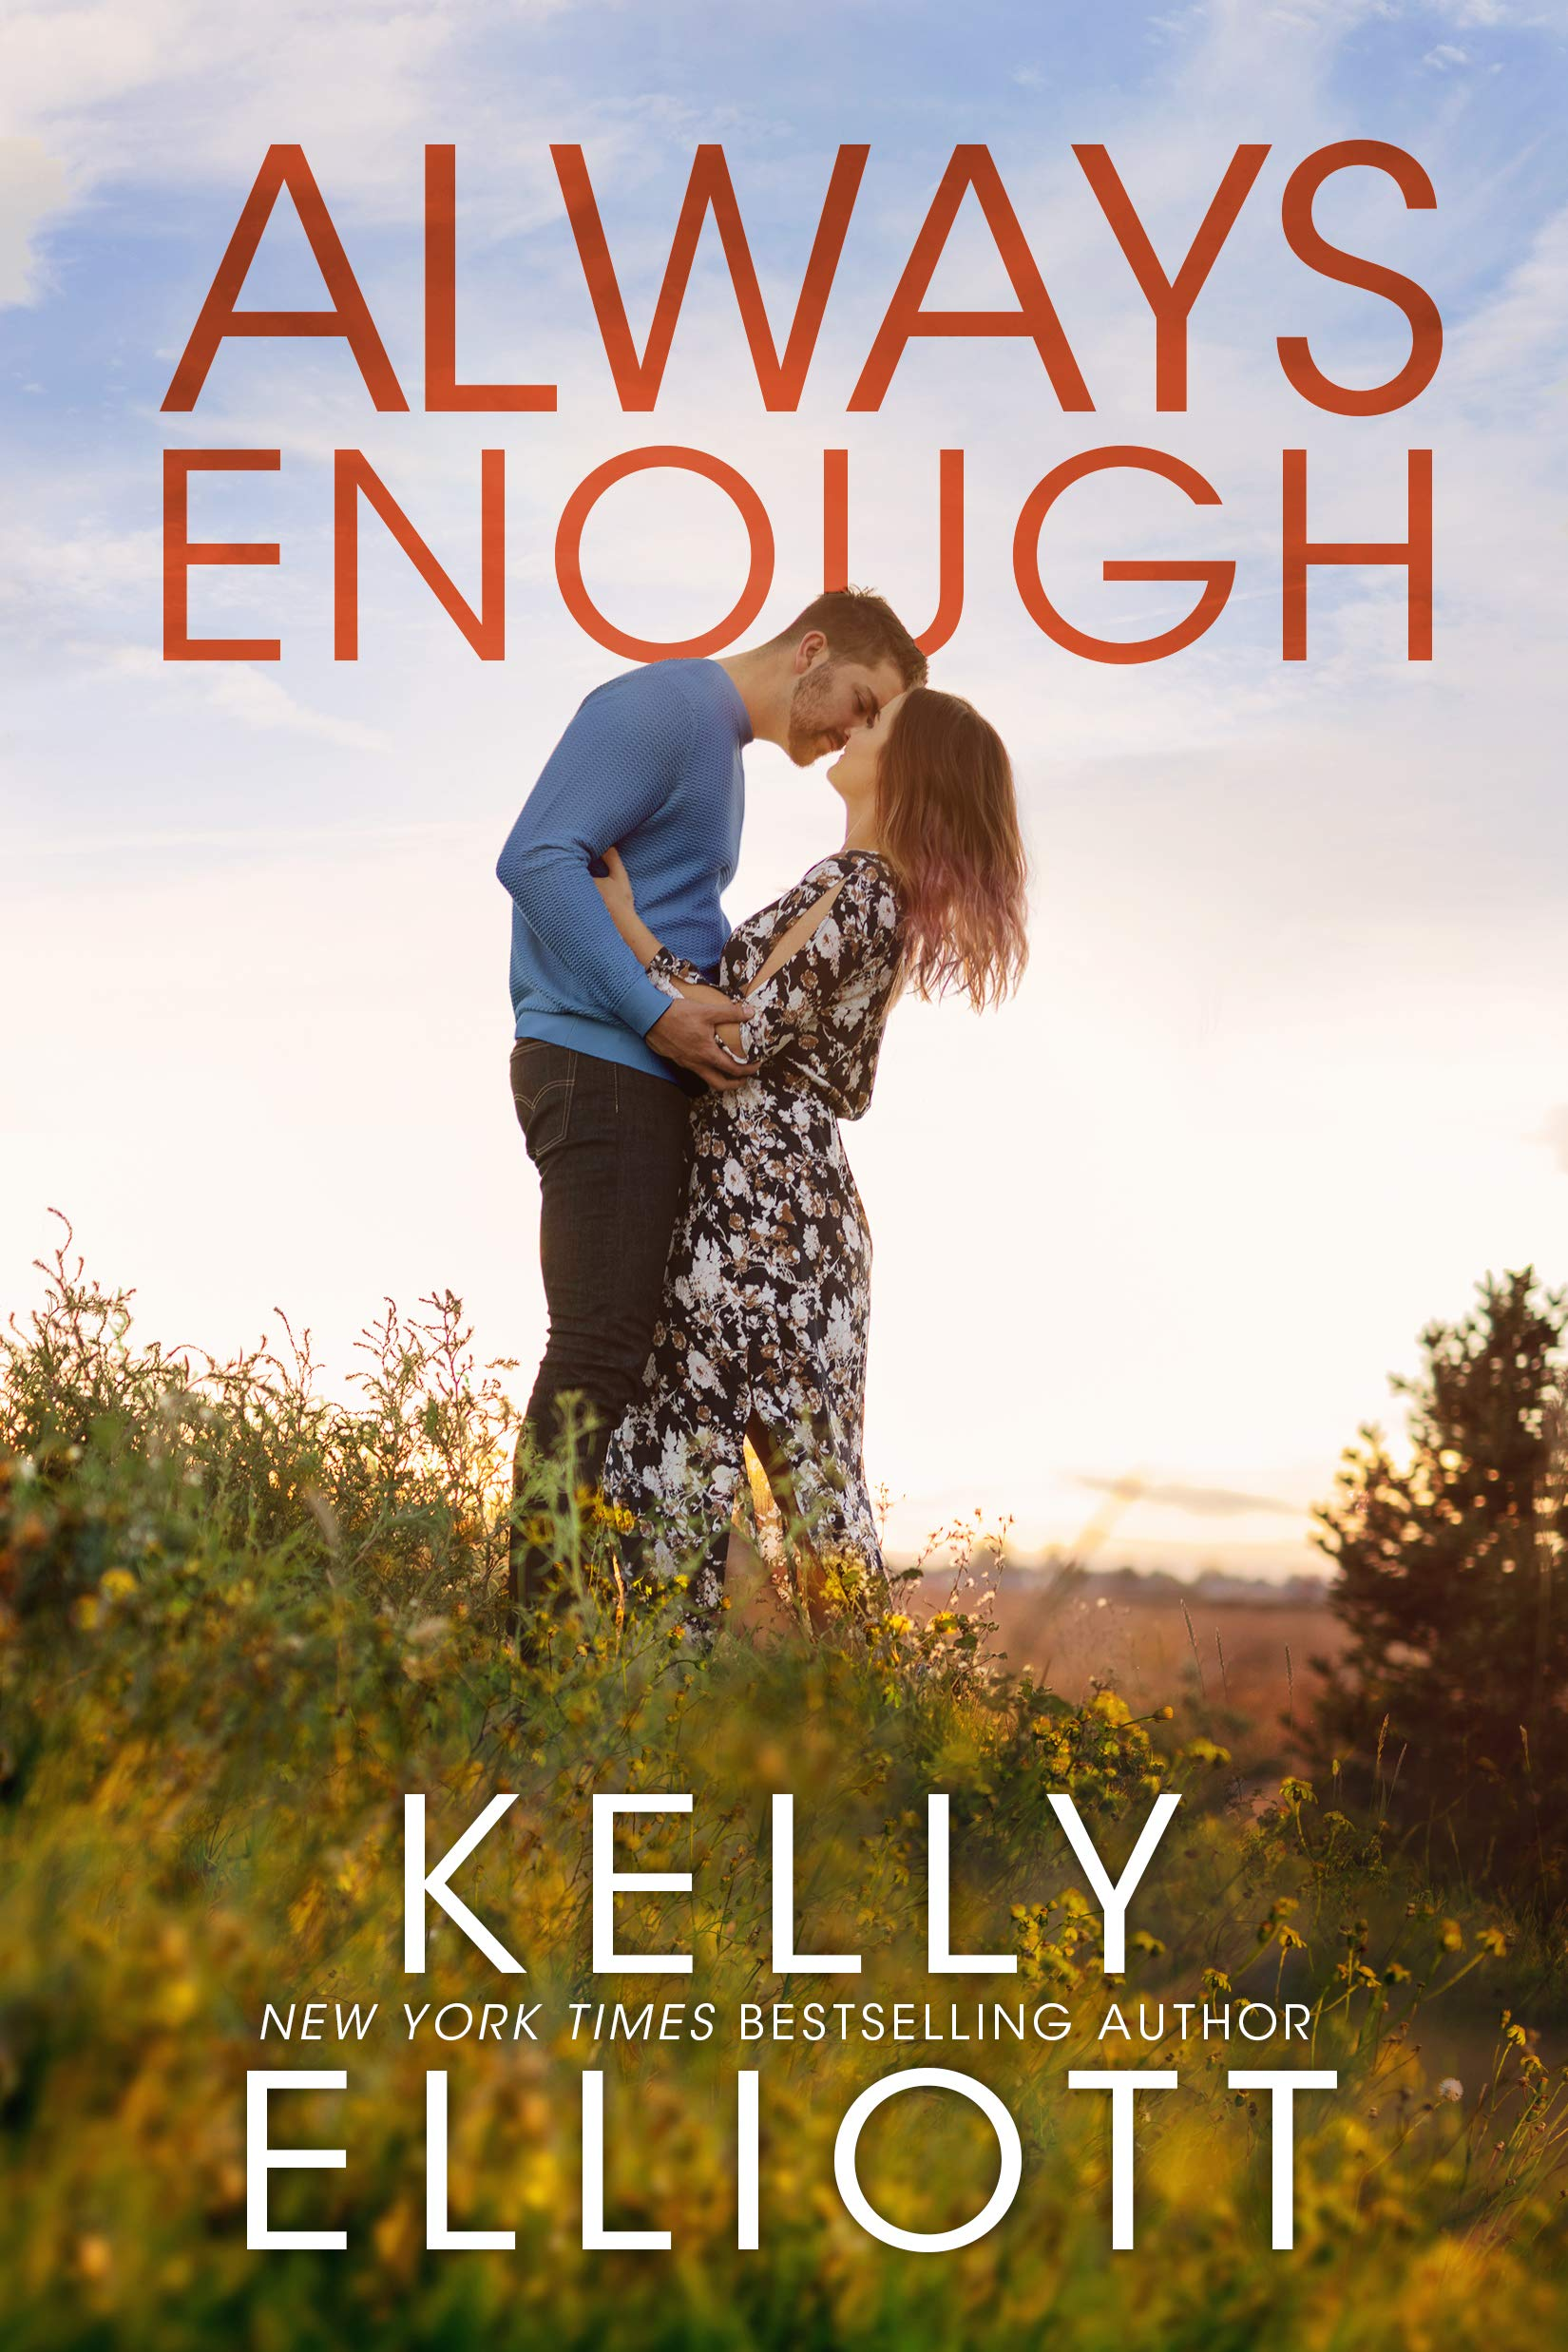 Amazon.com: Always Enough (Meet Me in Montana) (9781542018579 ...